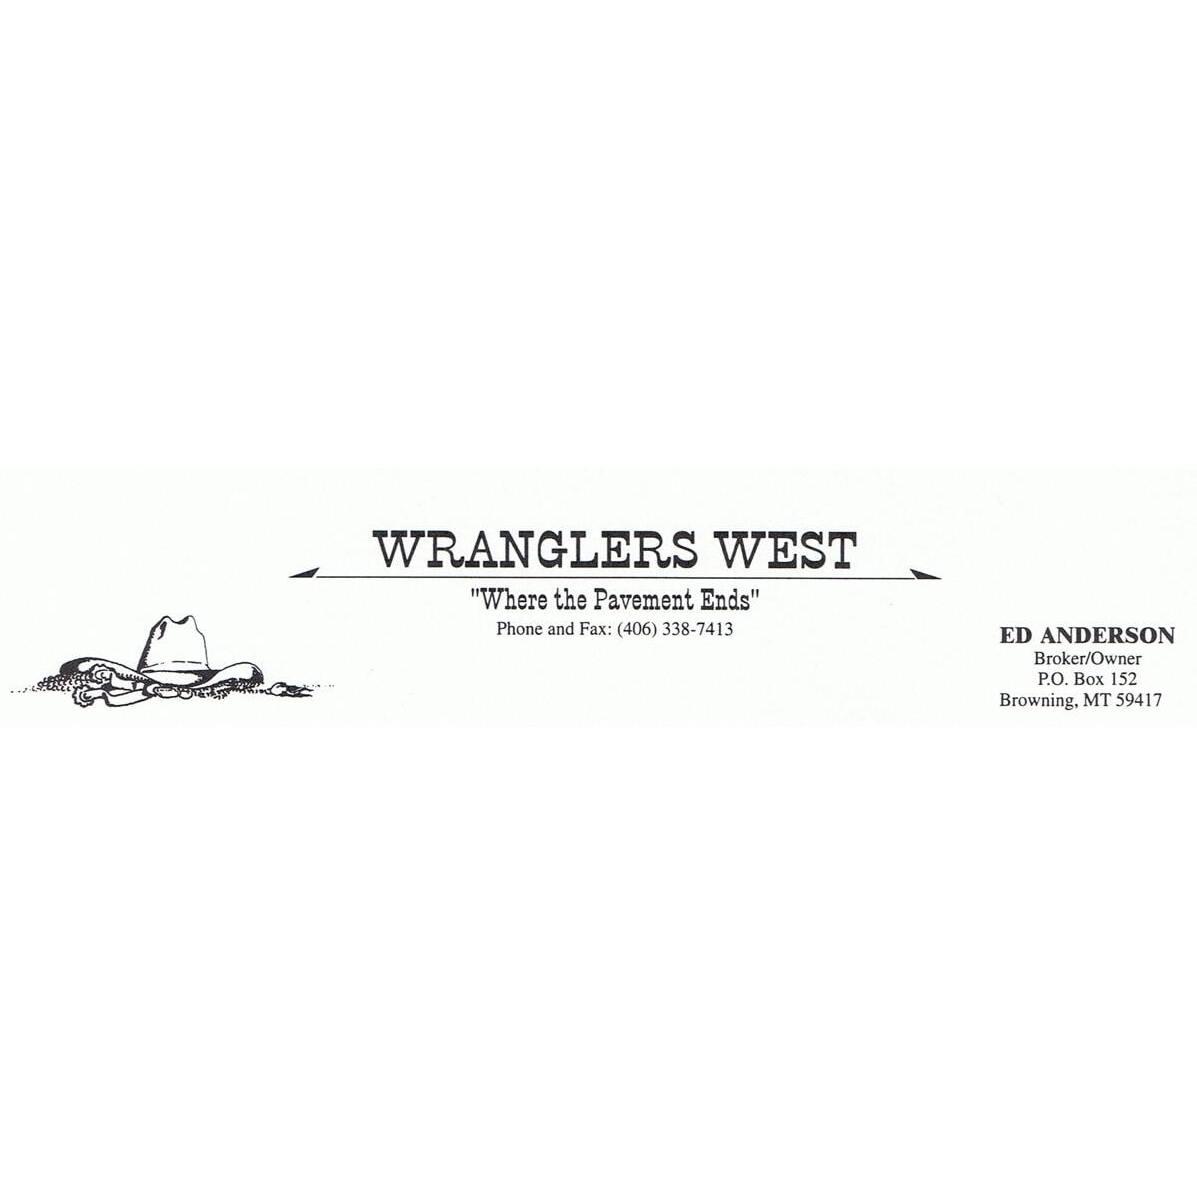 Wrangler's West Real Estate